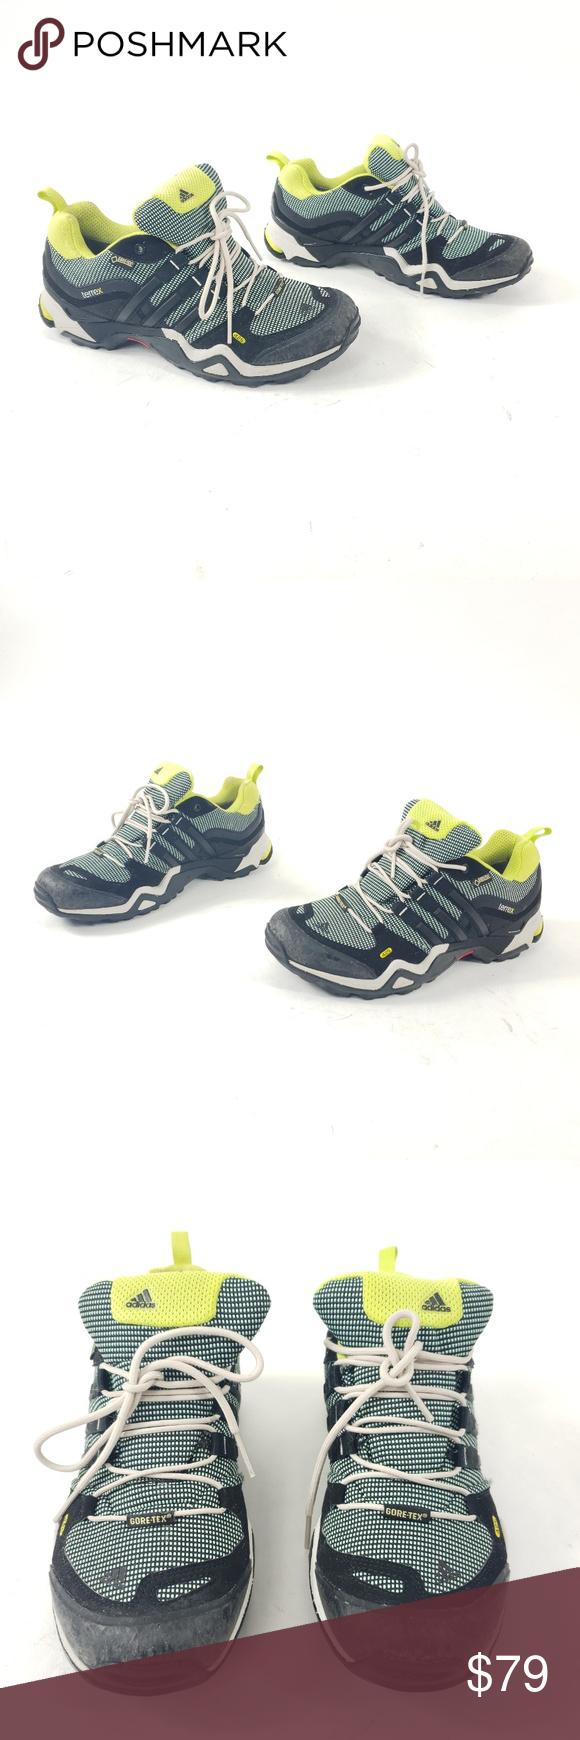 Adidas Ortholite Goretex Terrex Traxion